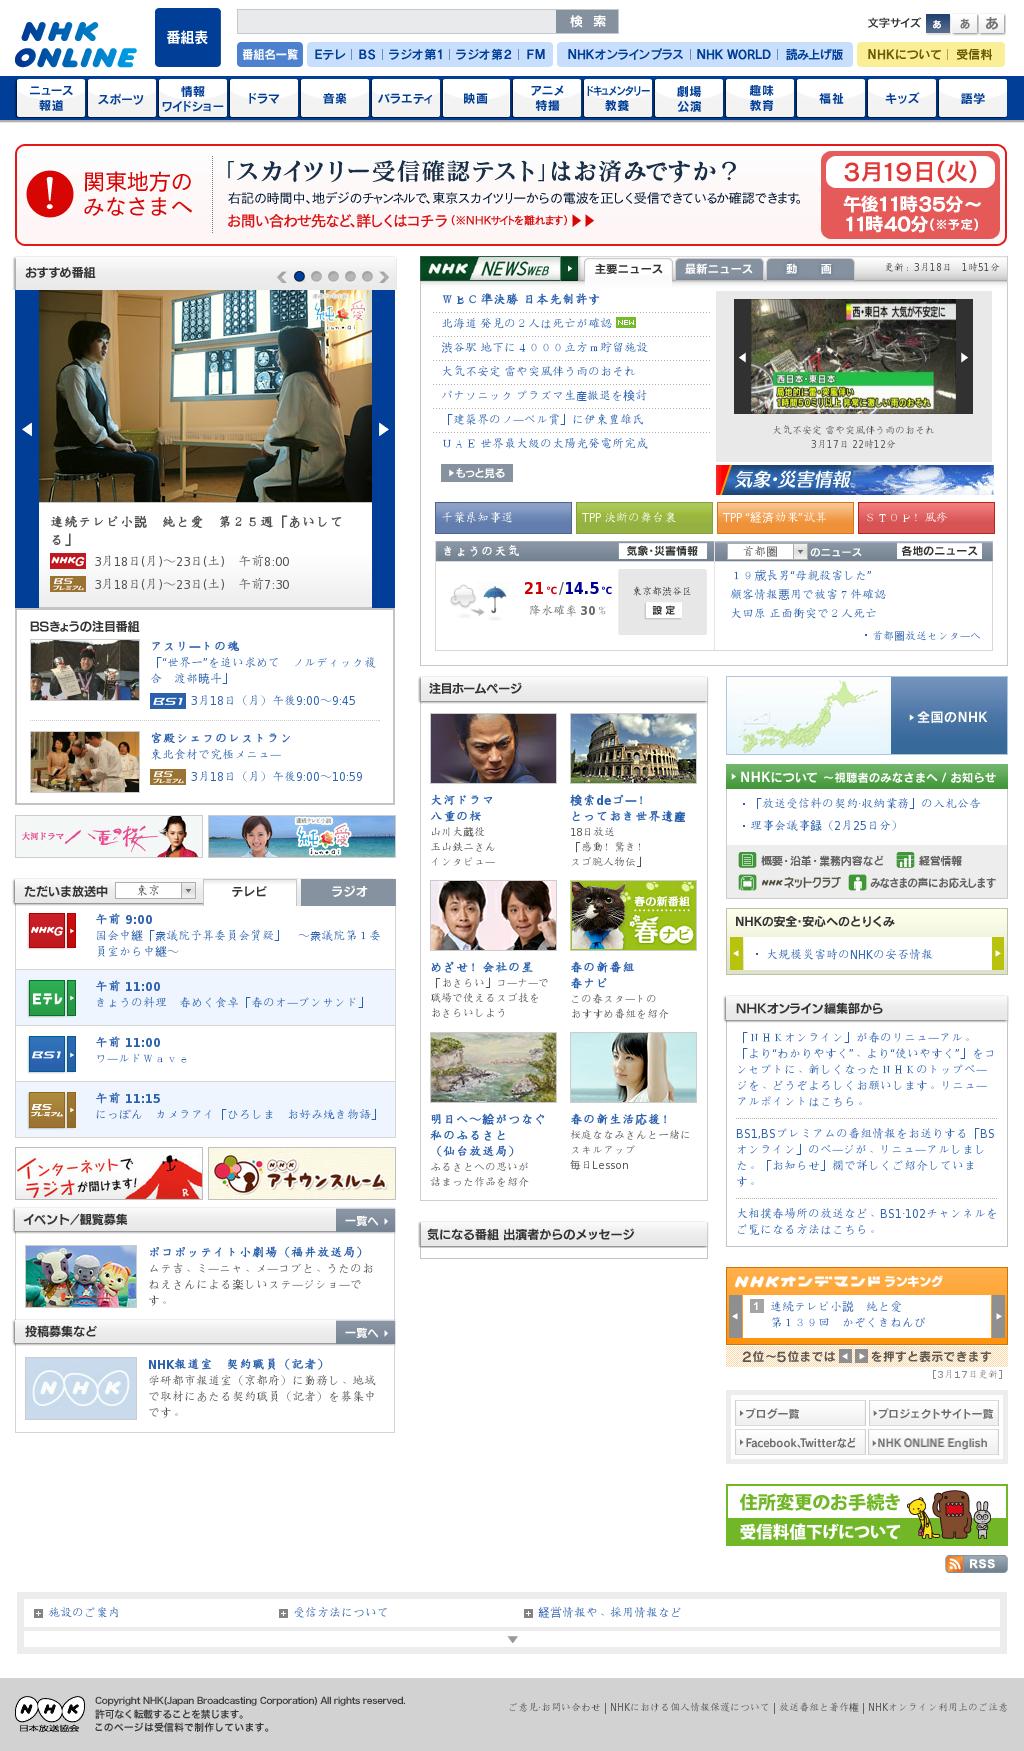 NHK Online at Monday March 18, 2013, 2:21 a.m. UTC